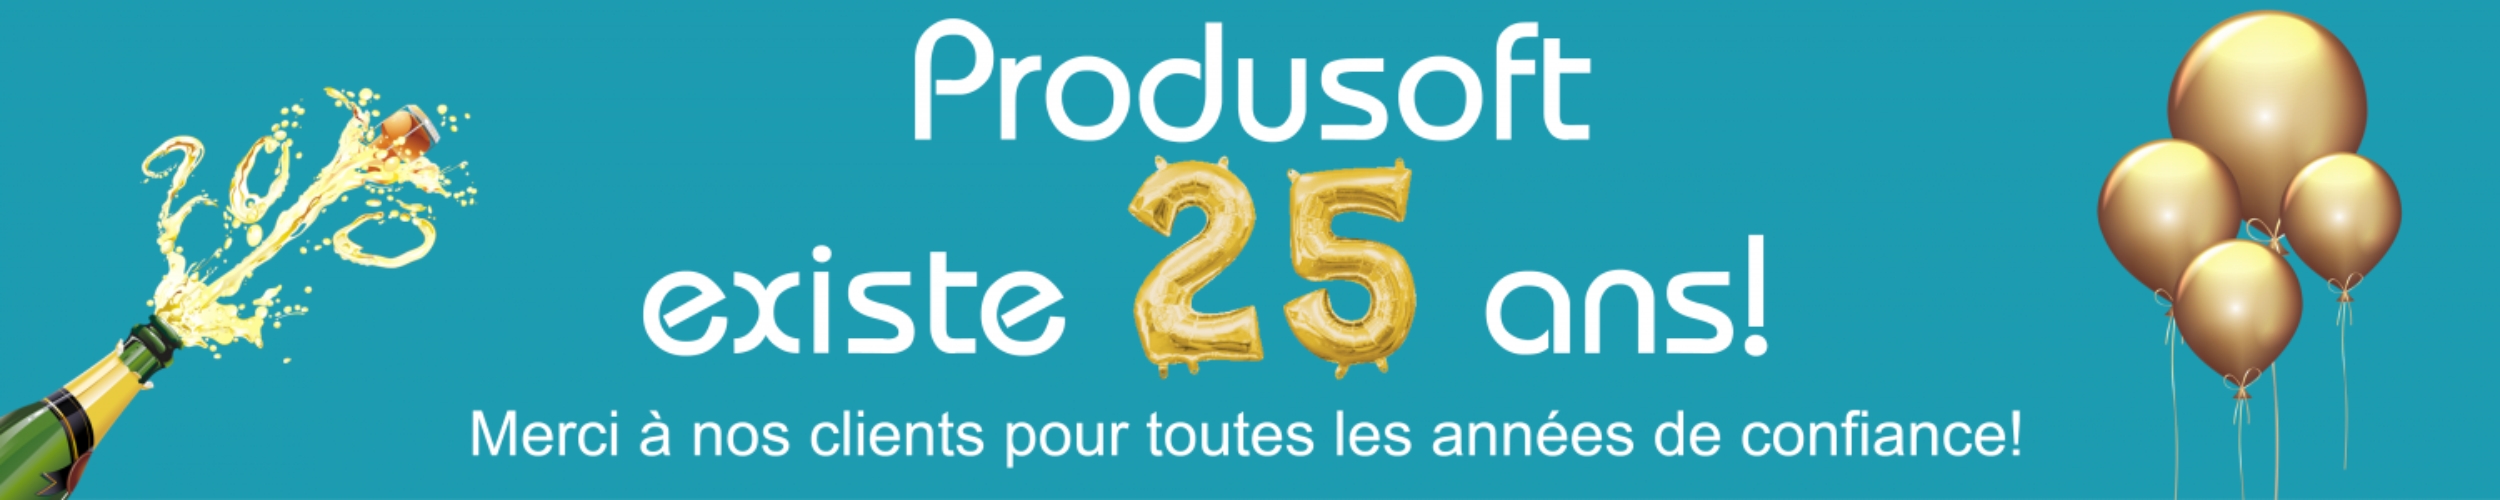 Produsoft existe 25 années!